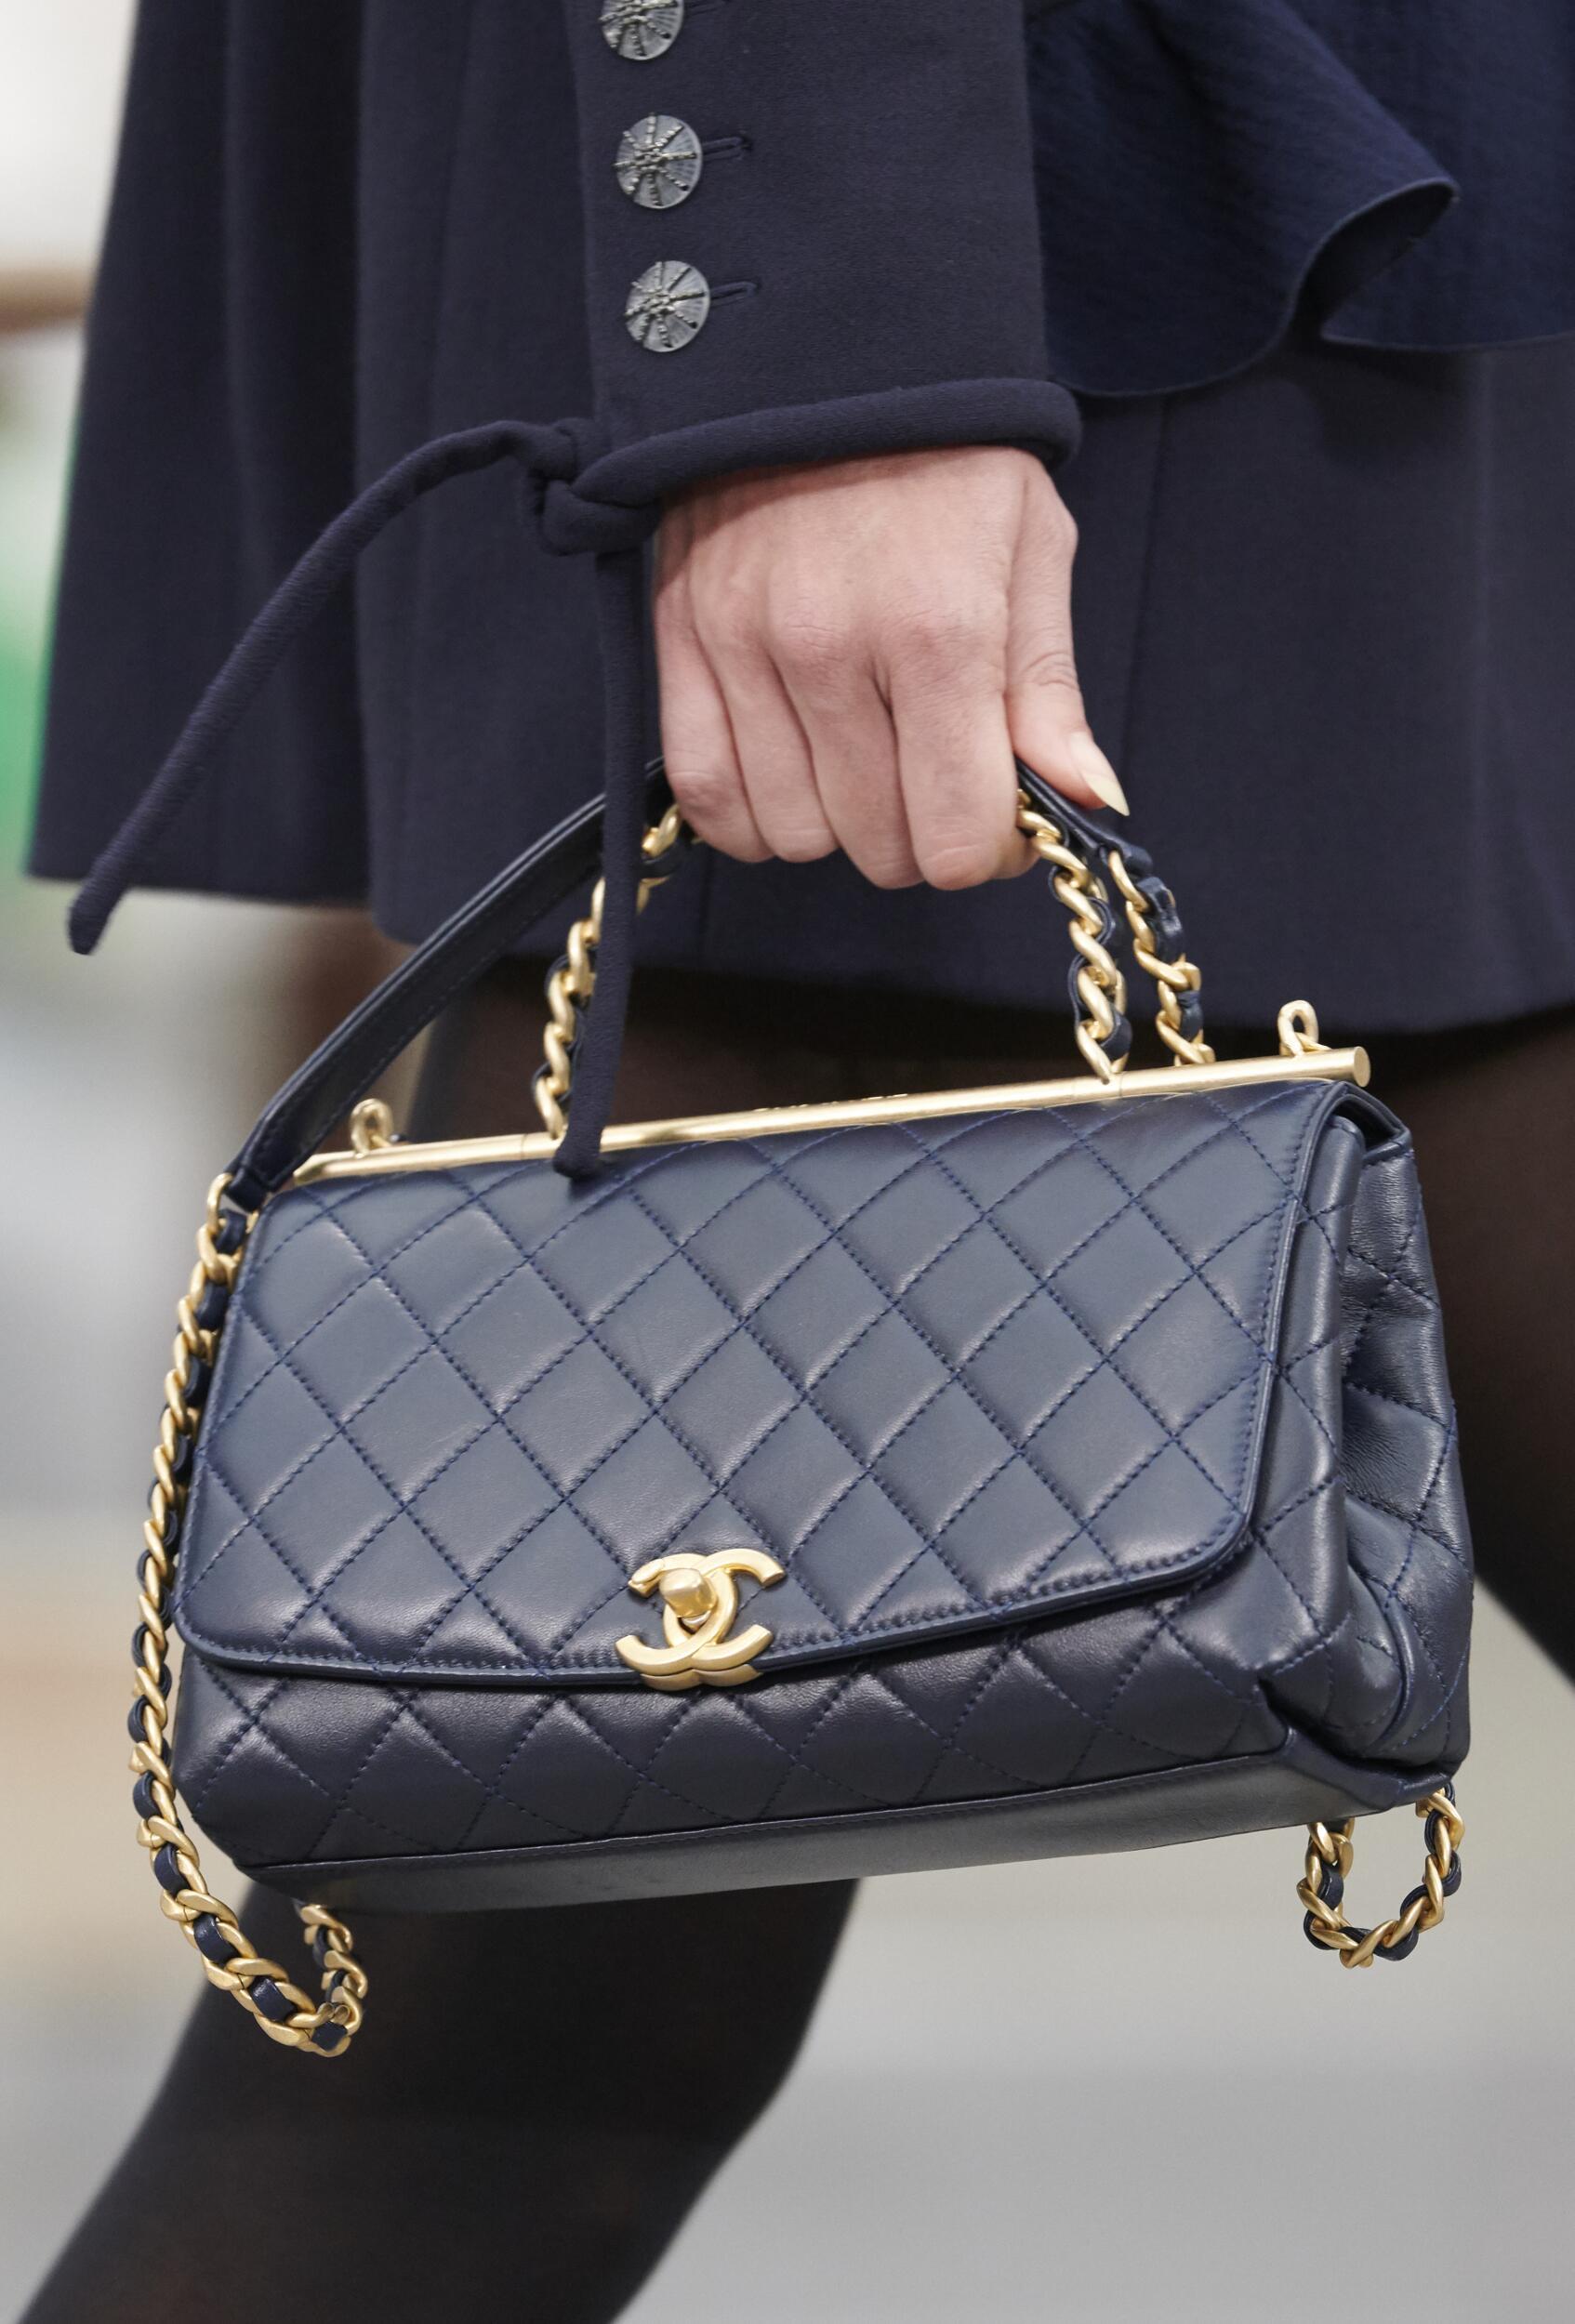 Bag Chanel Summer Trends 2020